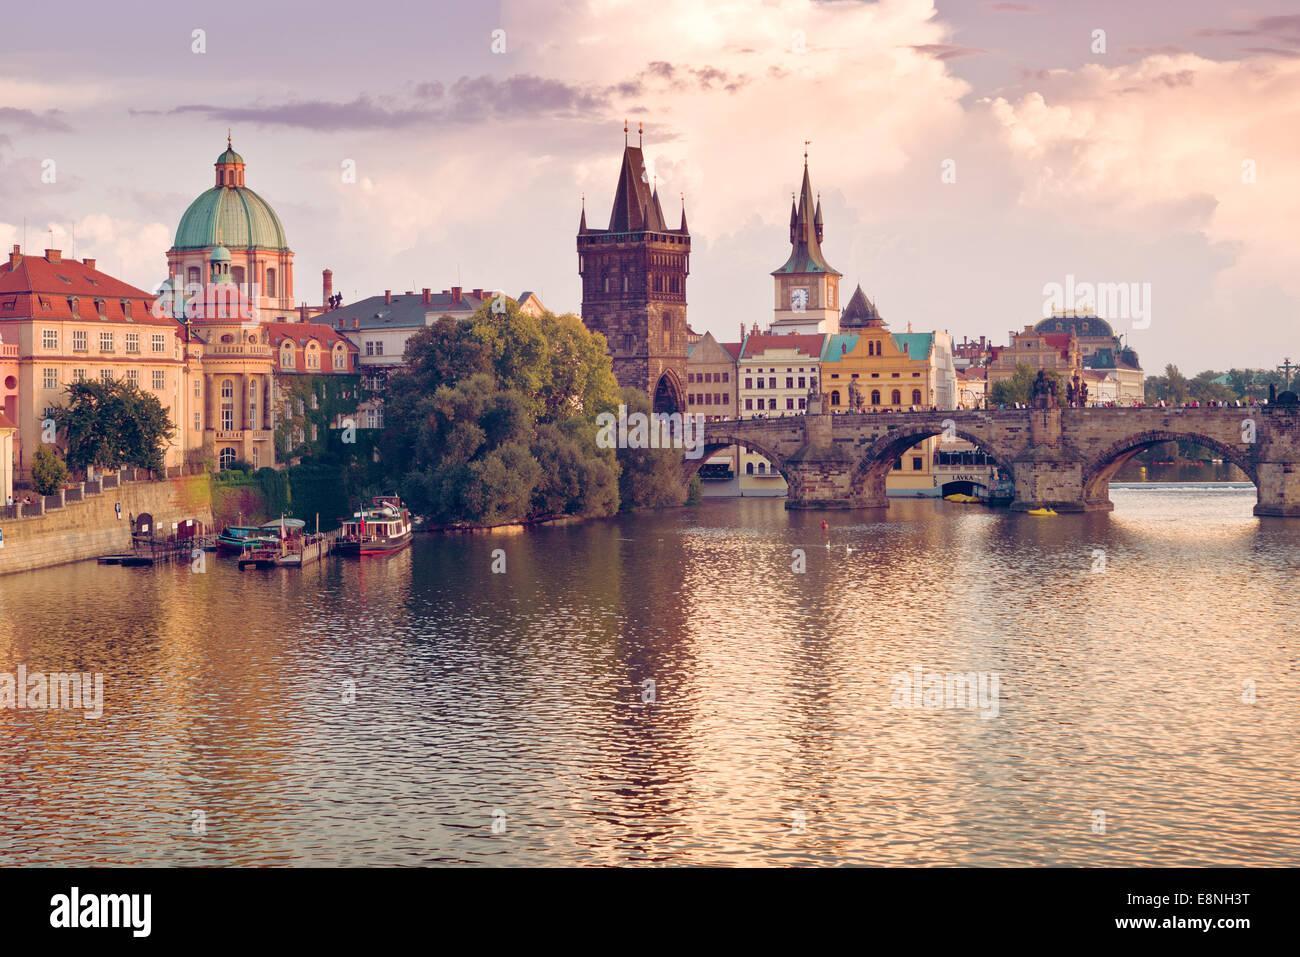 Karlsbrücke und Türme der Prager Altstadt am Ufer des Flusses Vltava Stockbild